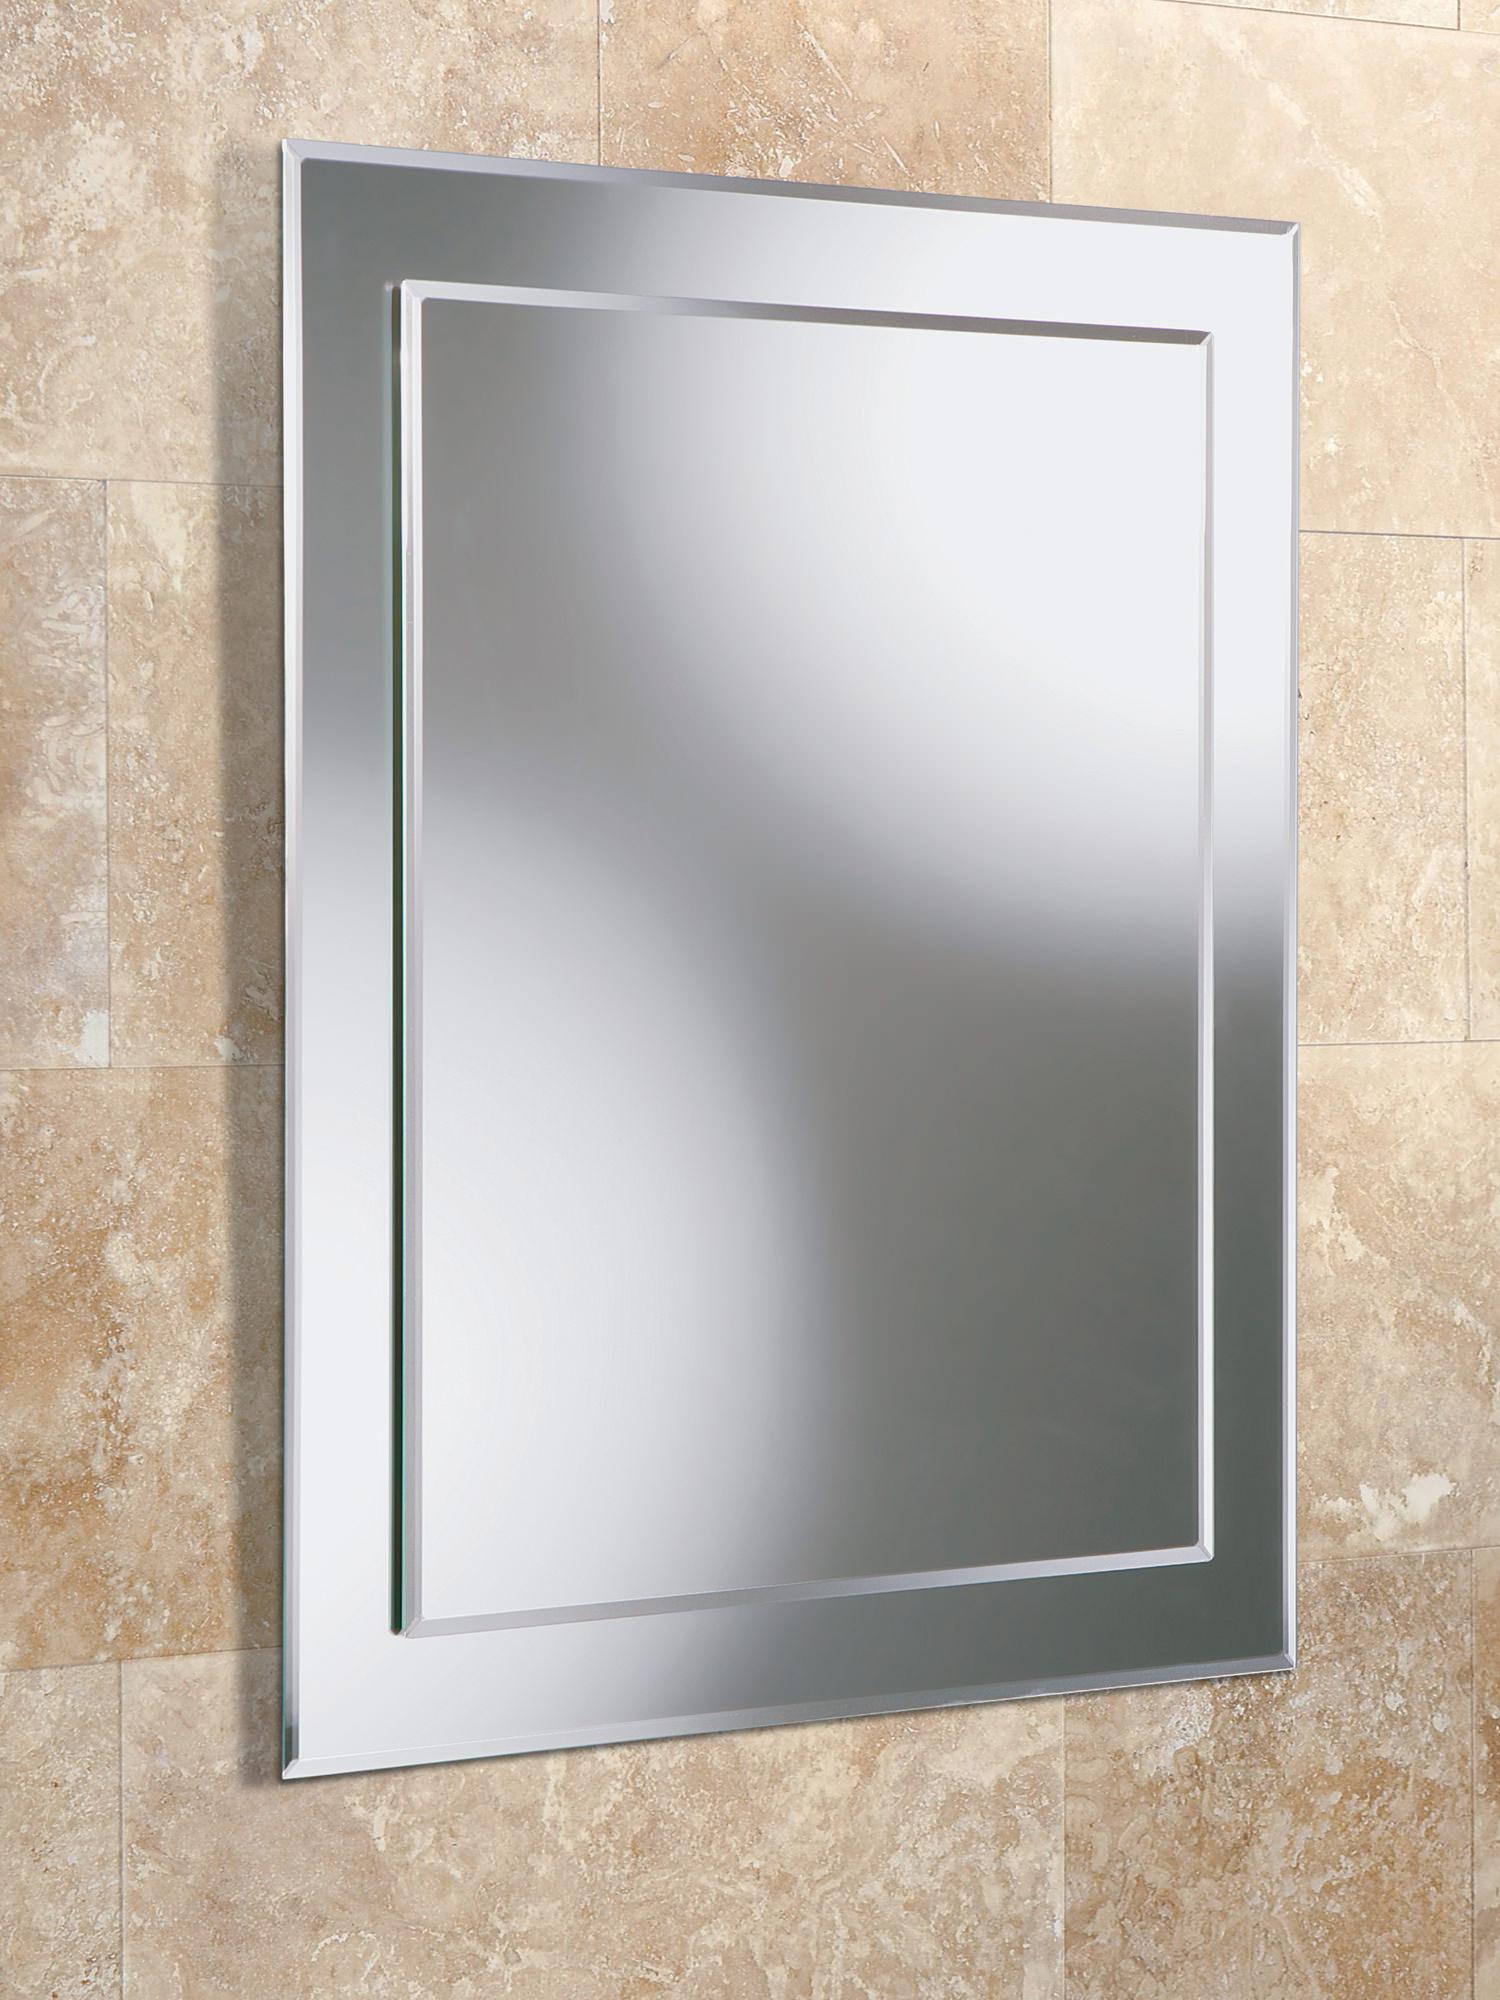 HIB Emma Rectangular Bevelled Mirror On Mirror 400 x 500mm | 63504000